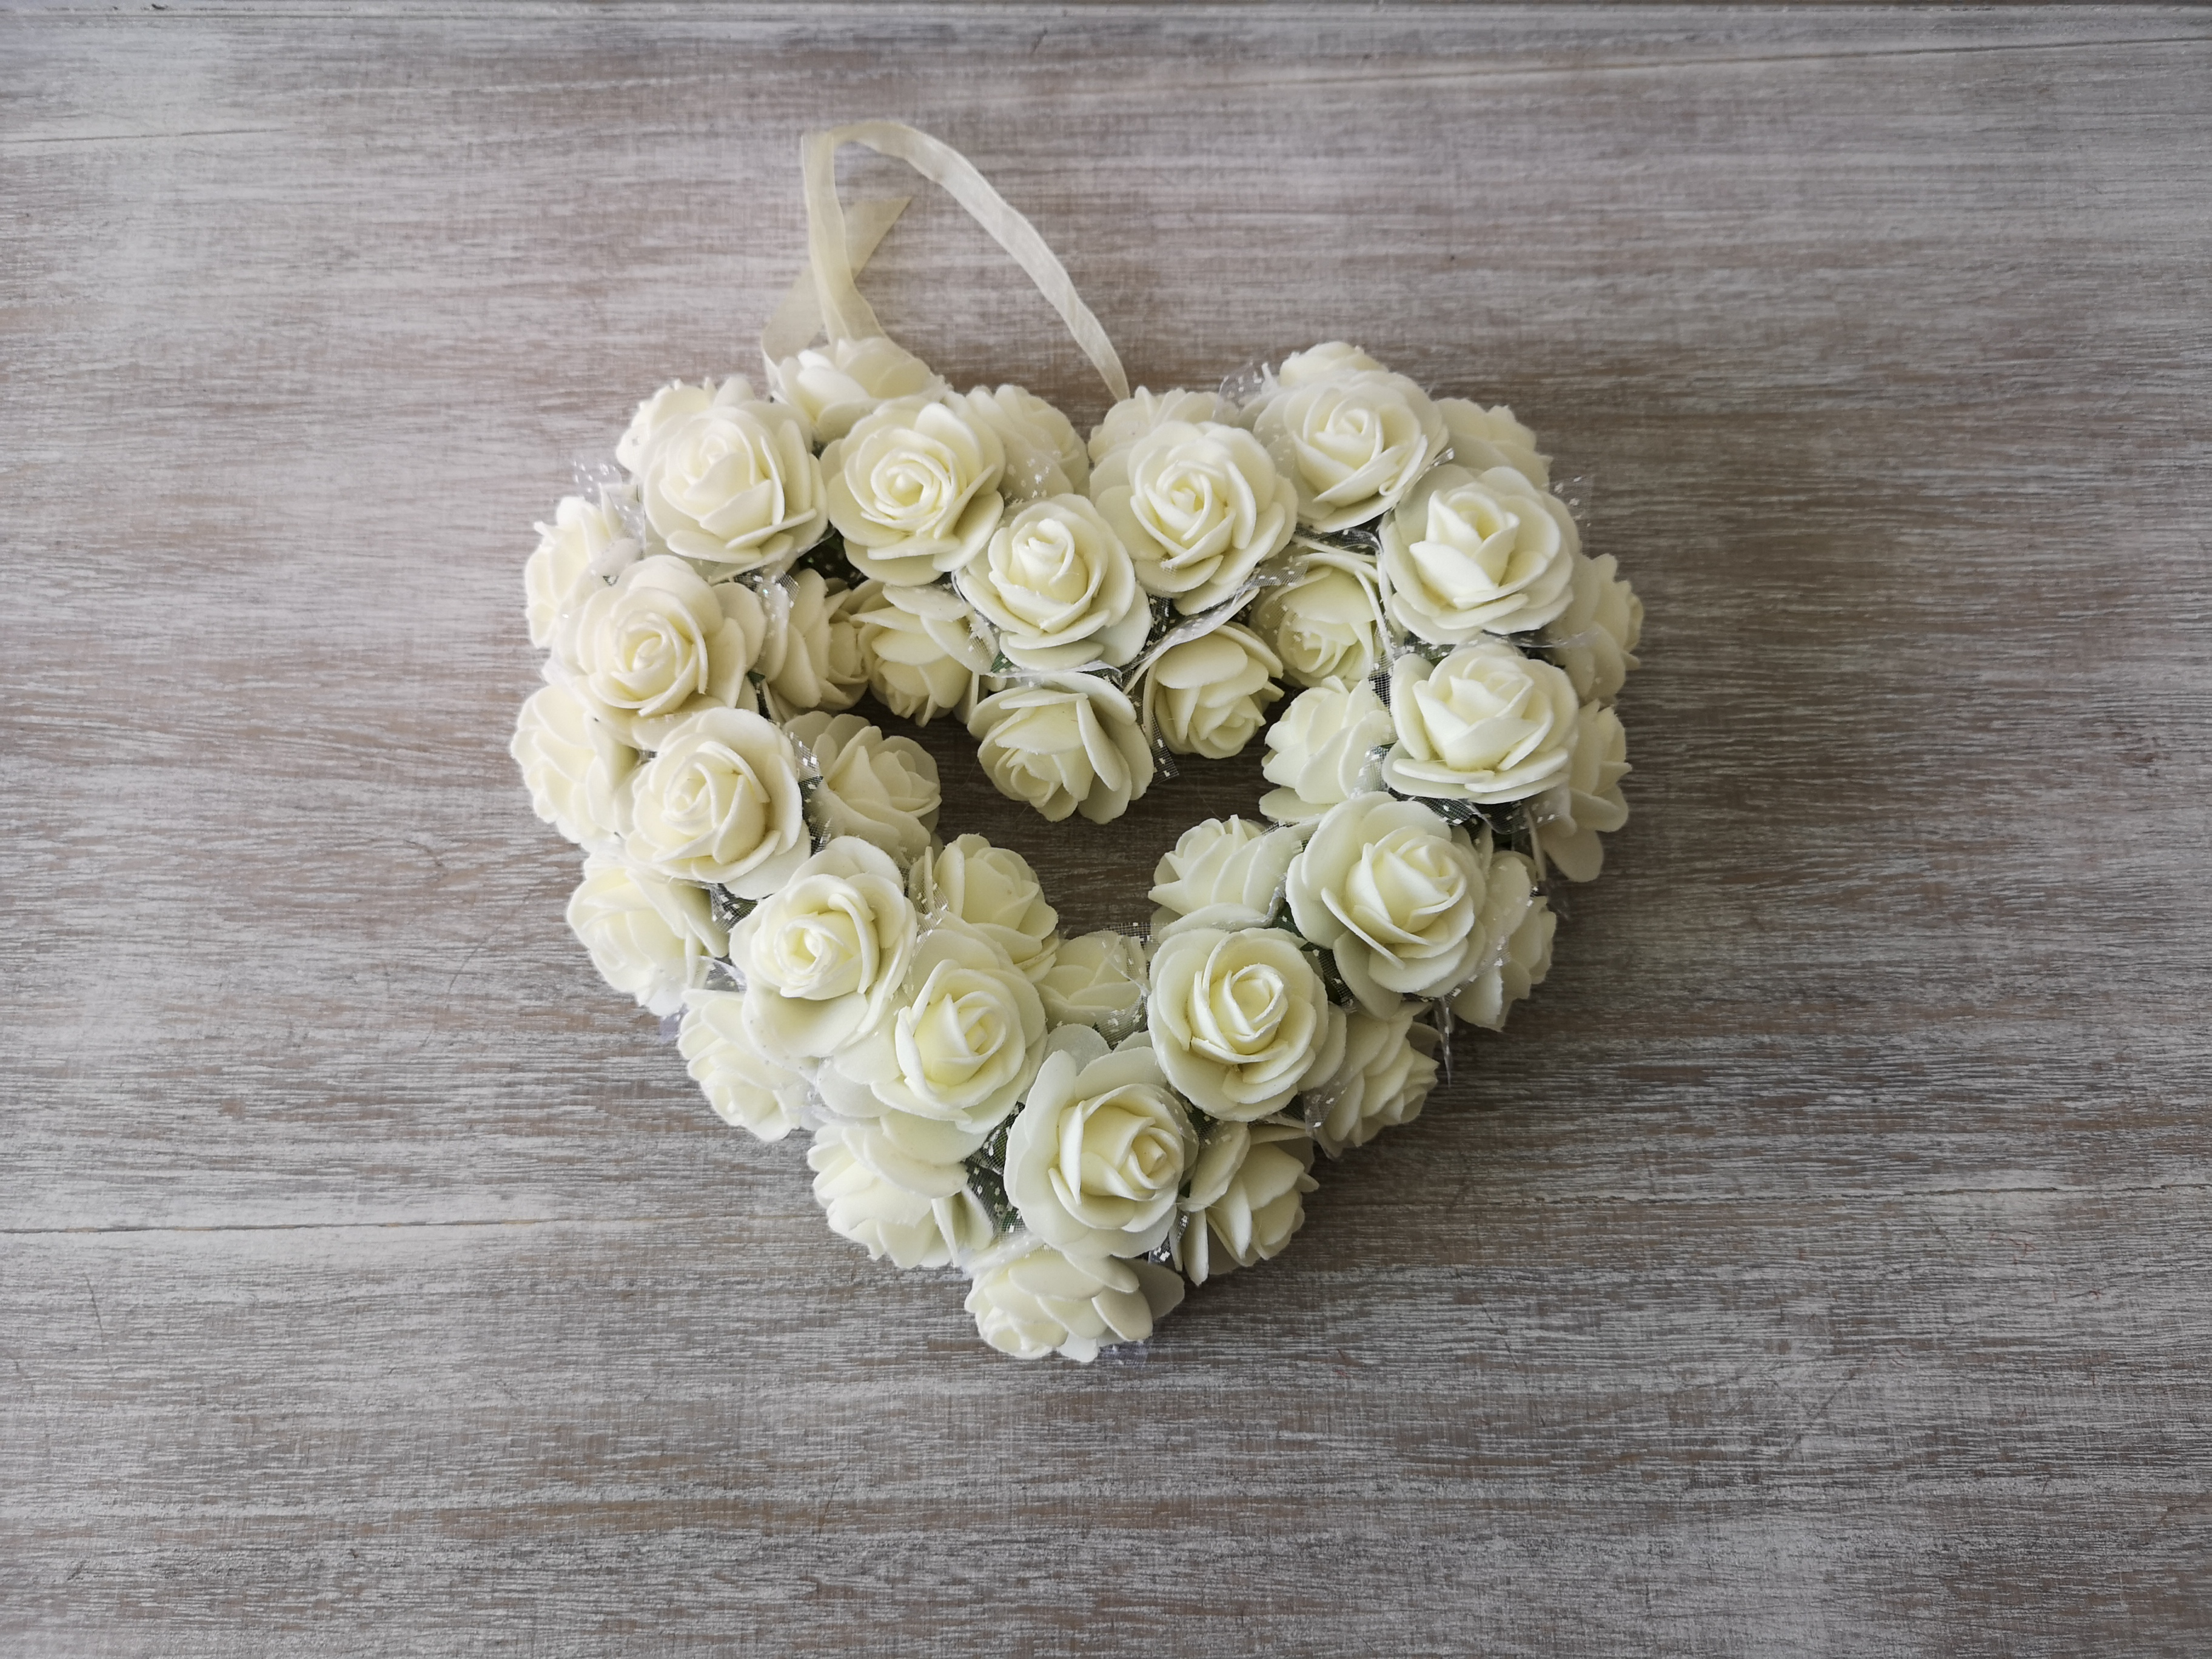 Medium White Rose Heart Wreath Medium-White-Rose-Heart-Wreath